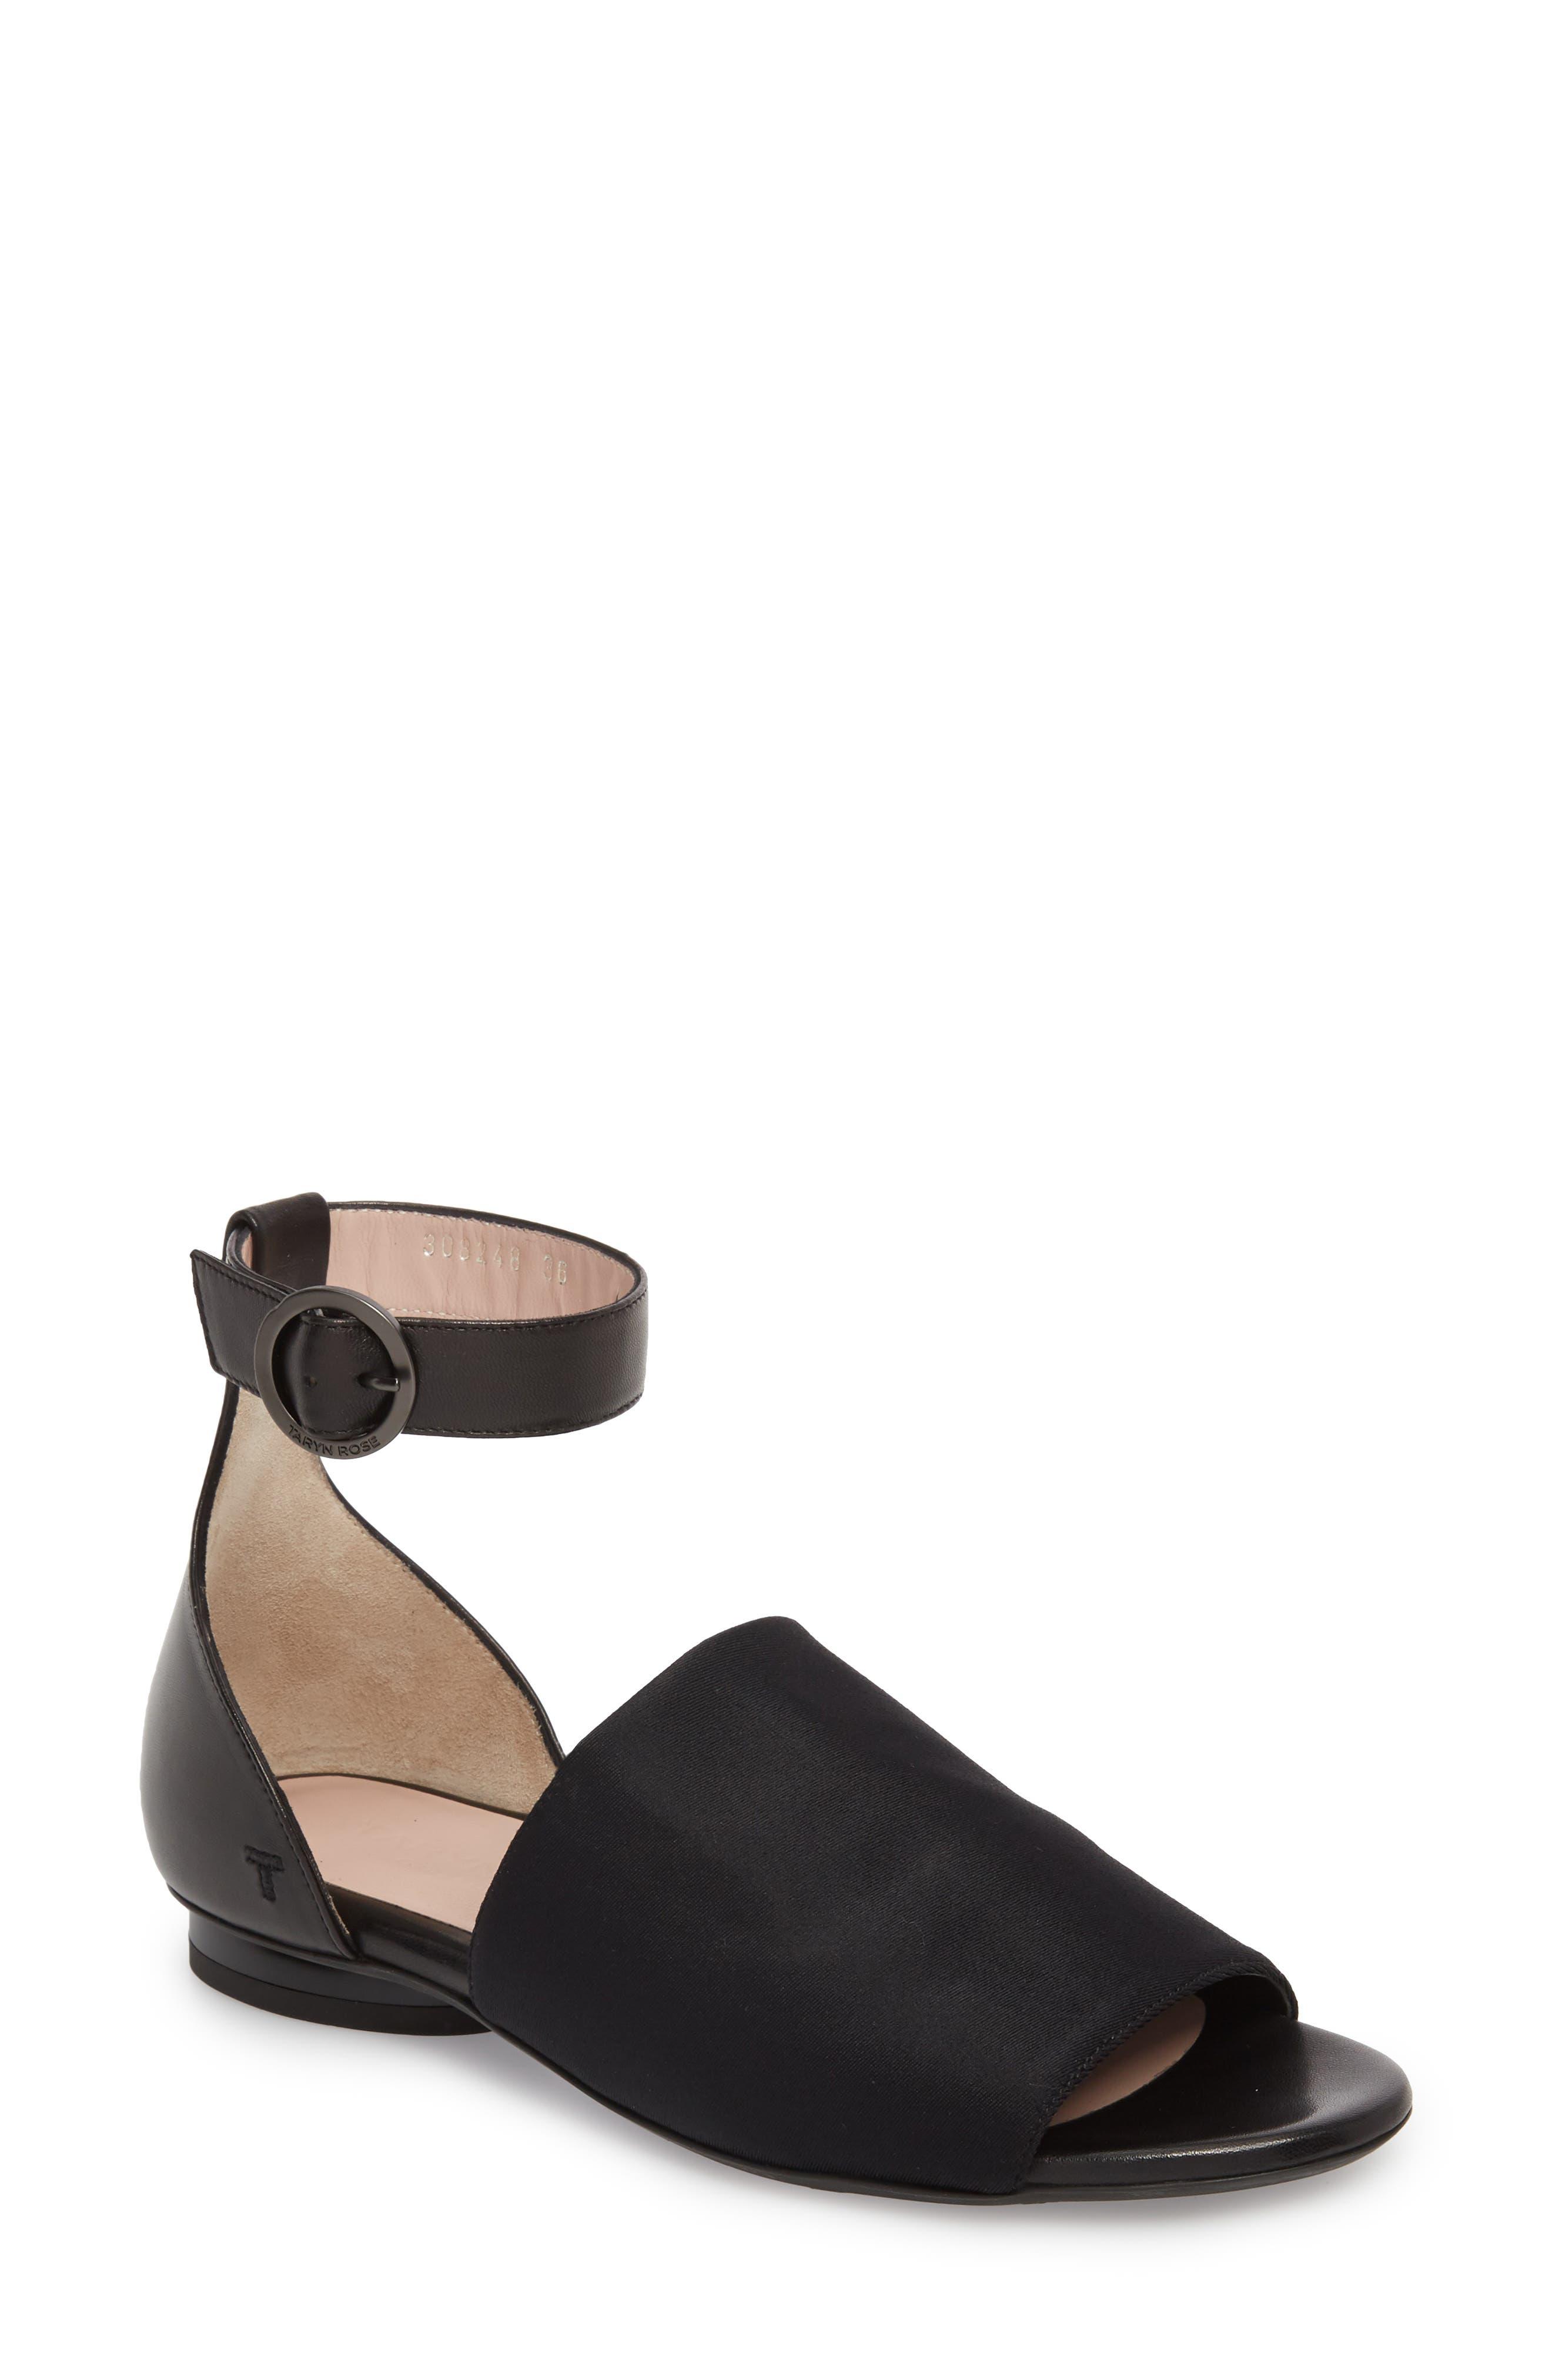 Taryn Rose Collection Donya Ankle Strap Sandal- Black